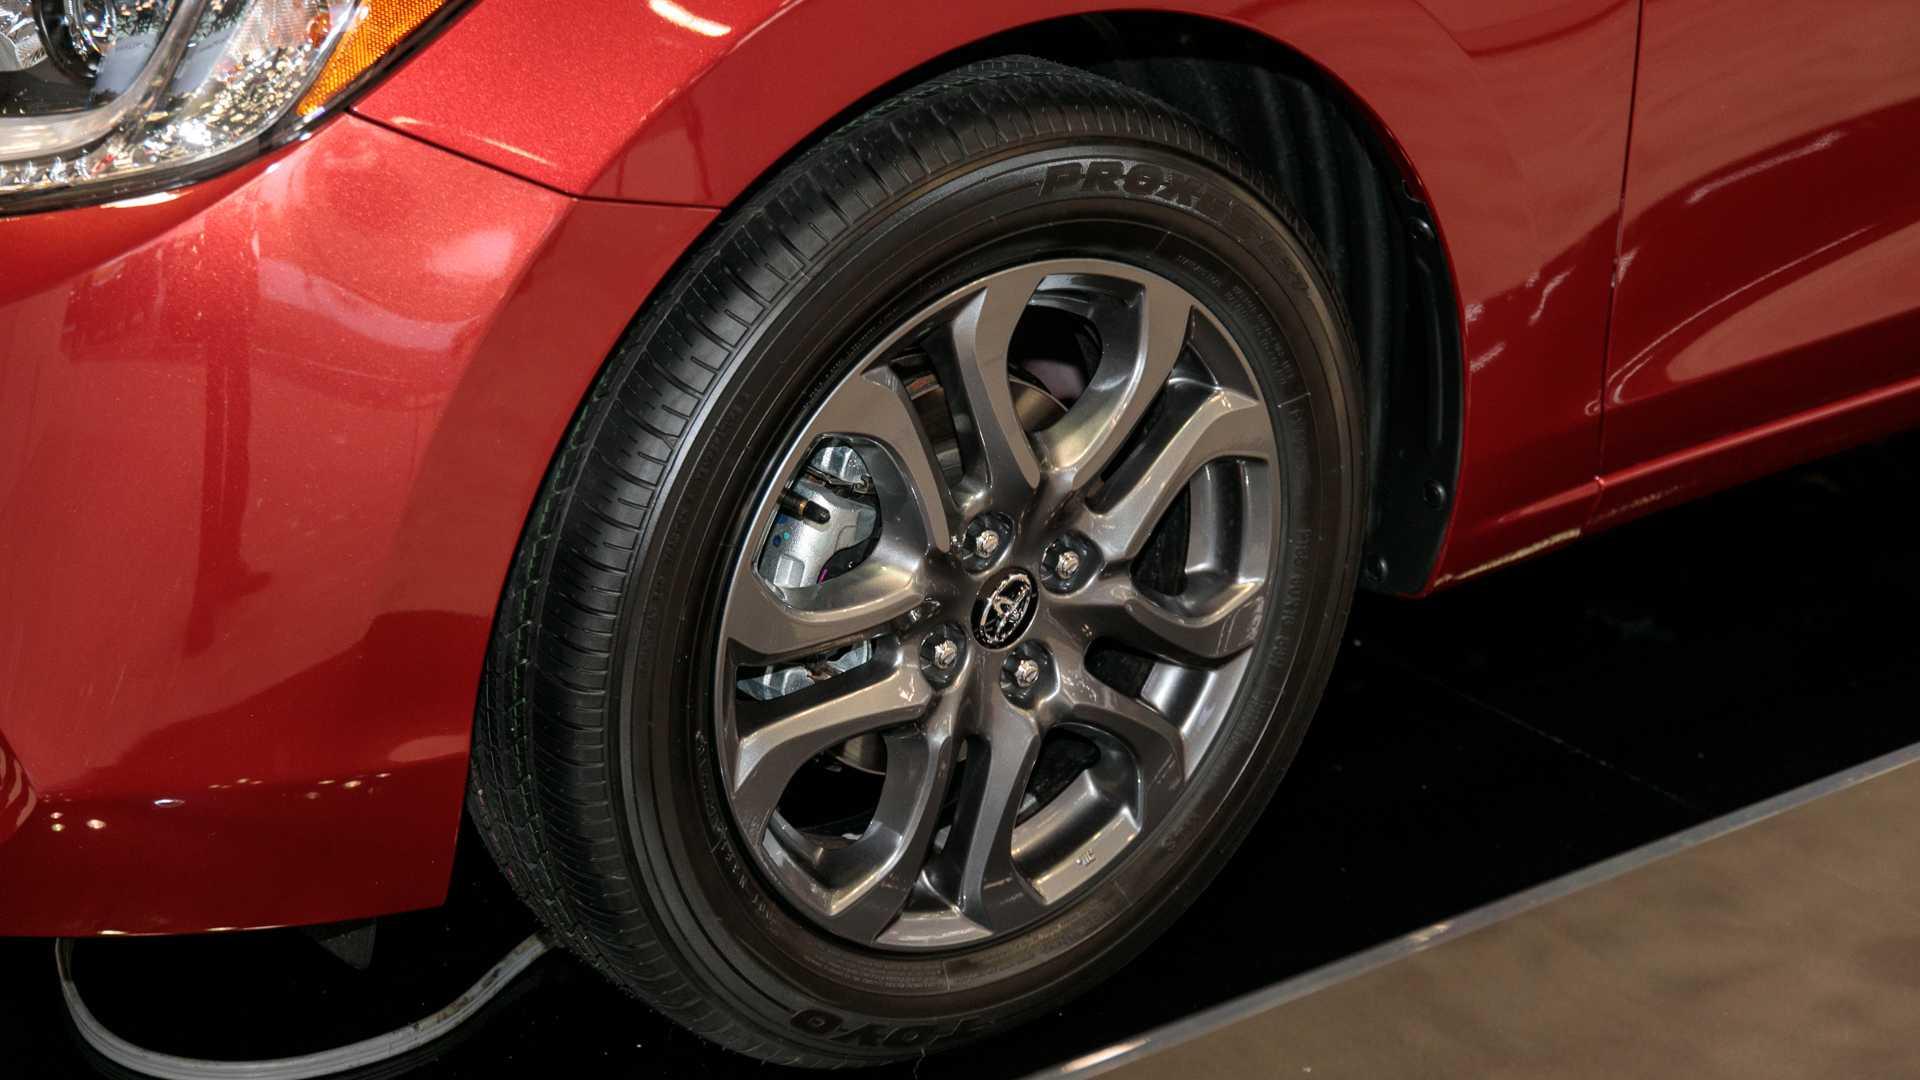 2020-toyota-yaris-hatchback-5.jpg